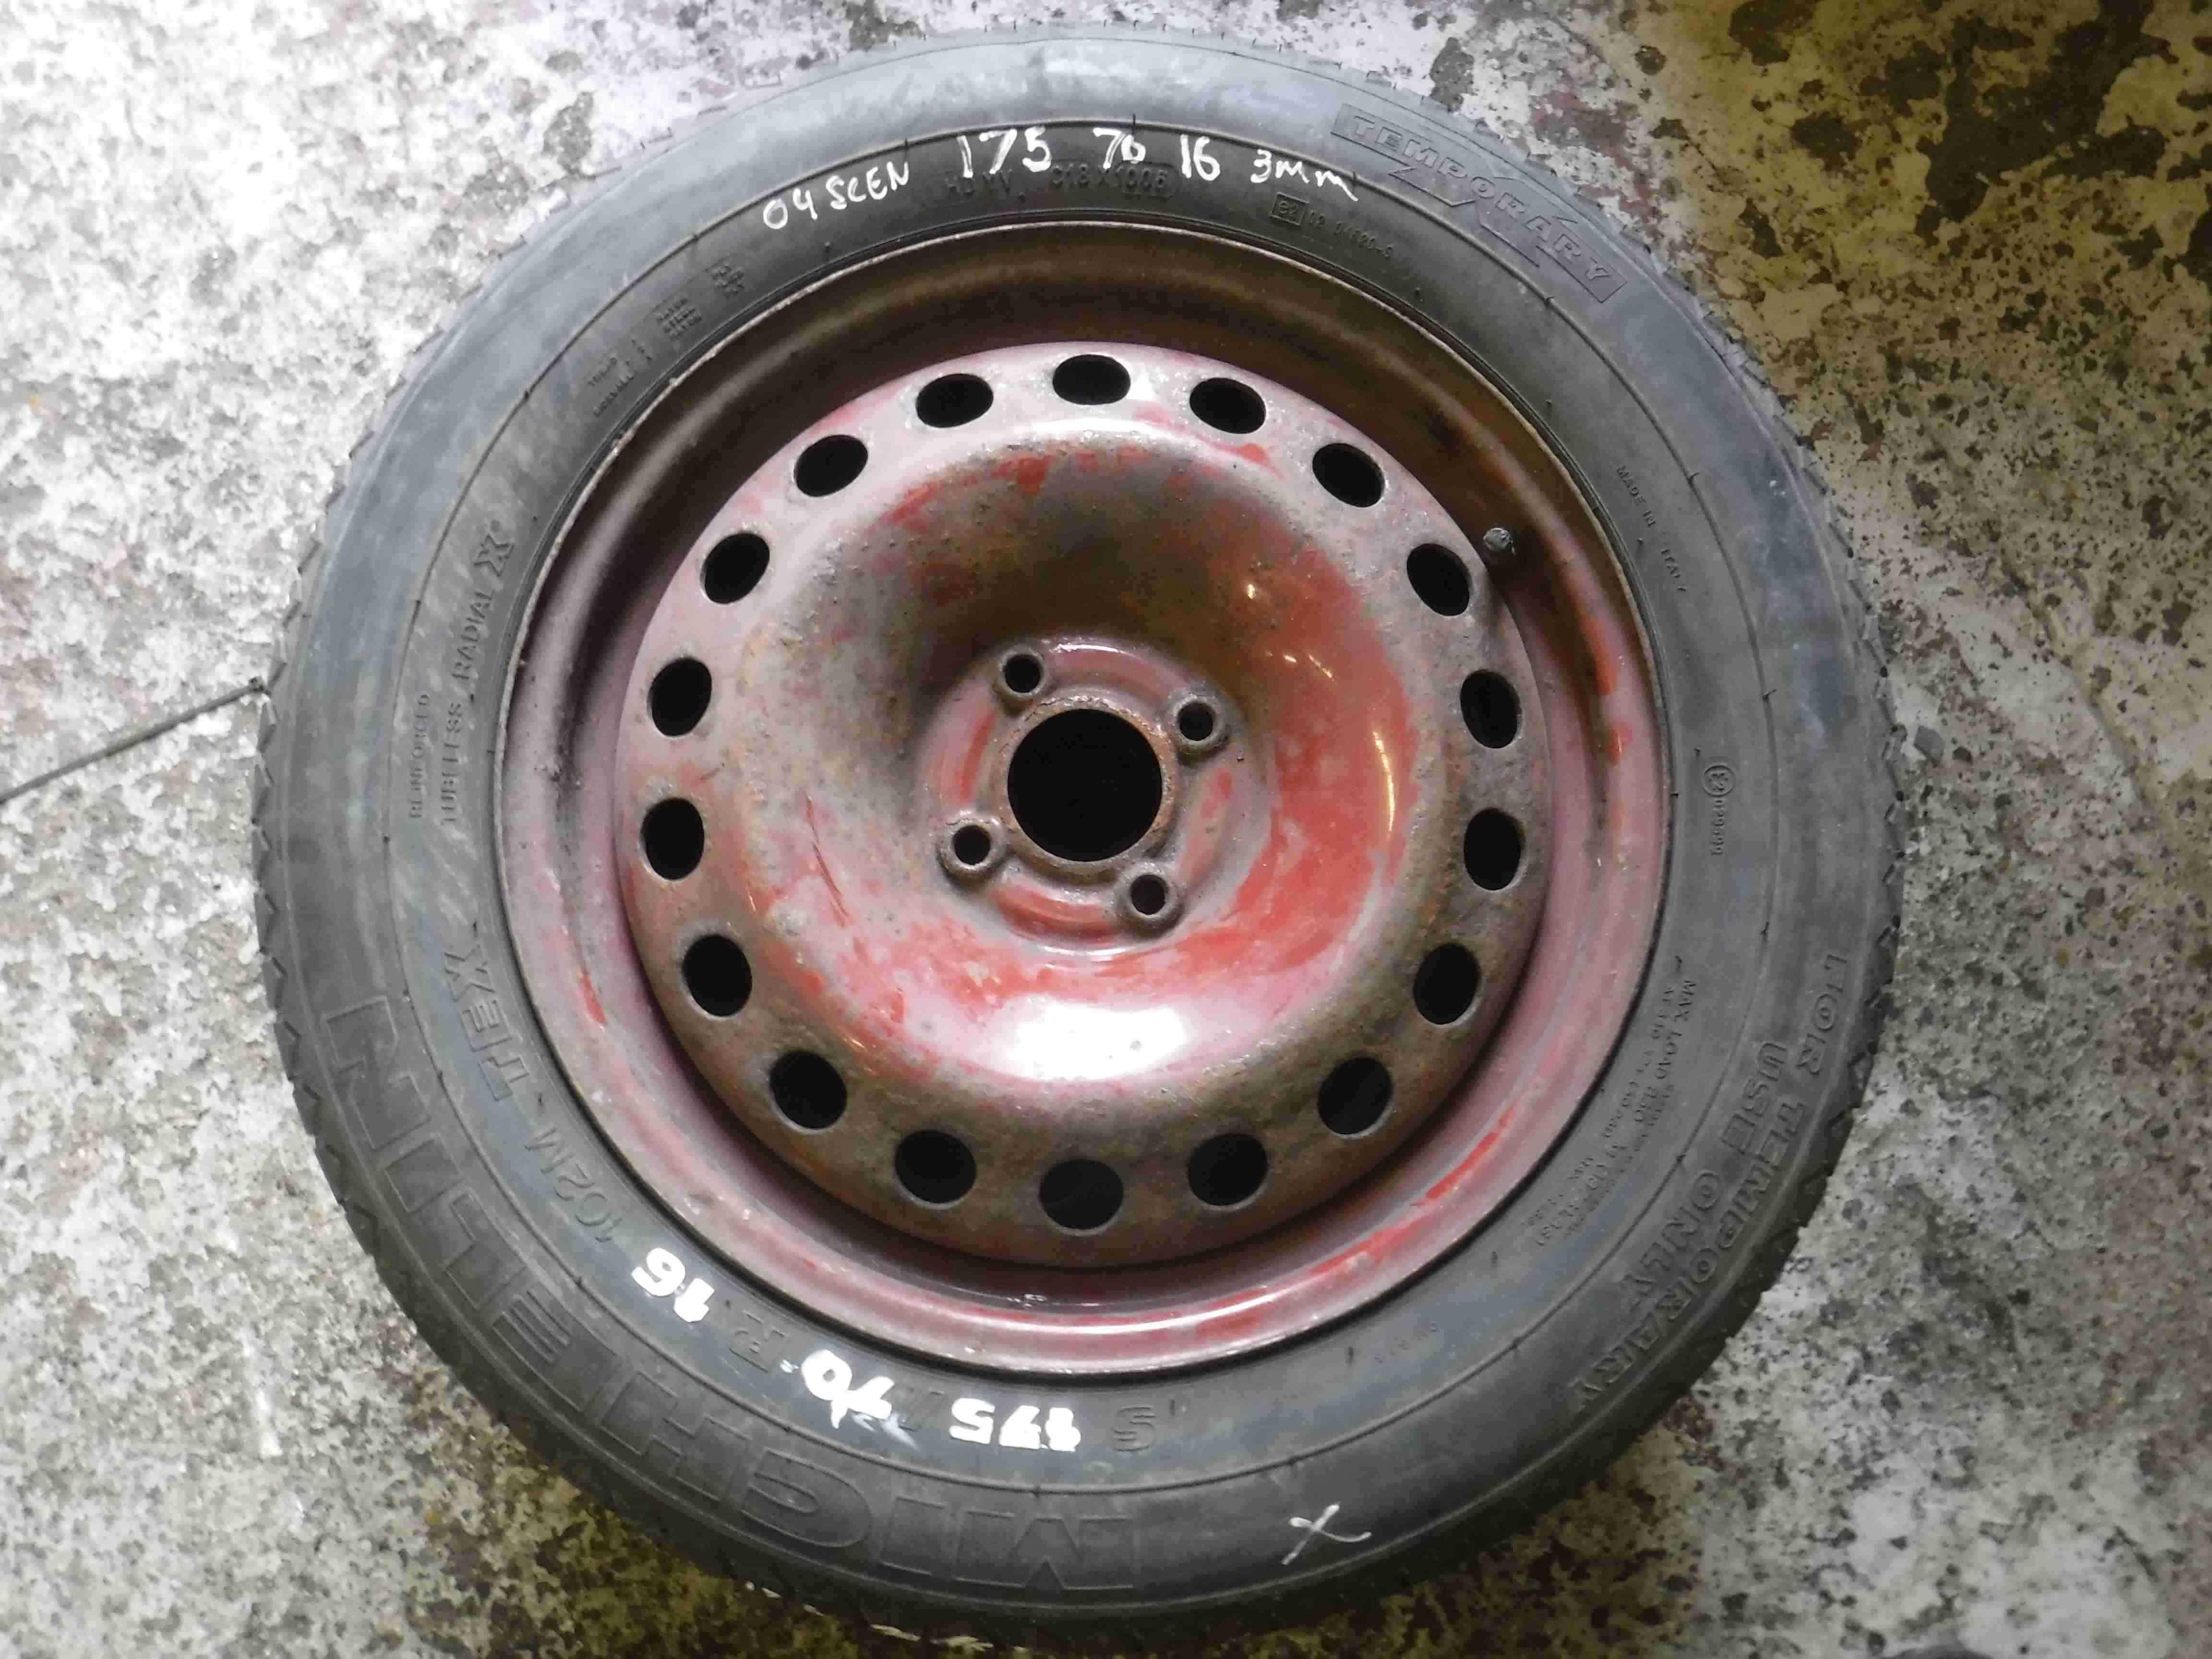 Renault Scenic 2003-2009 Space Saver Steel Wheel + Tyre 175 70 16 3mm